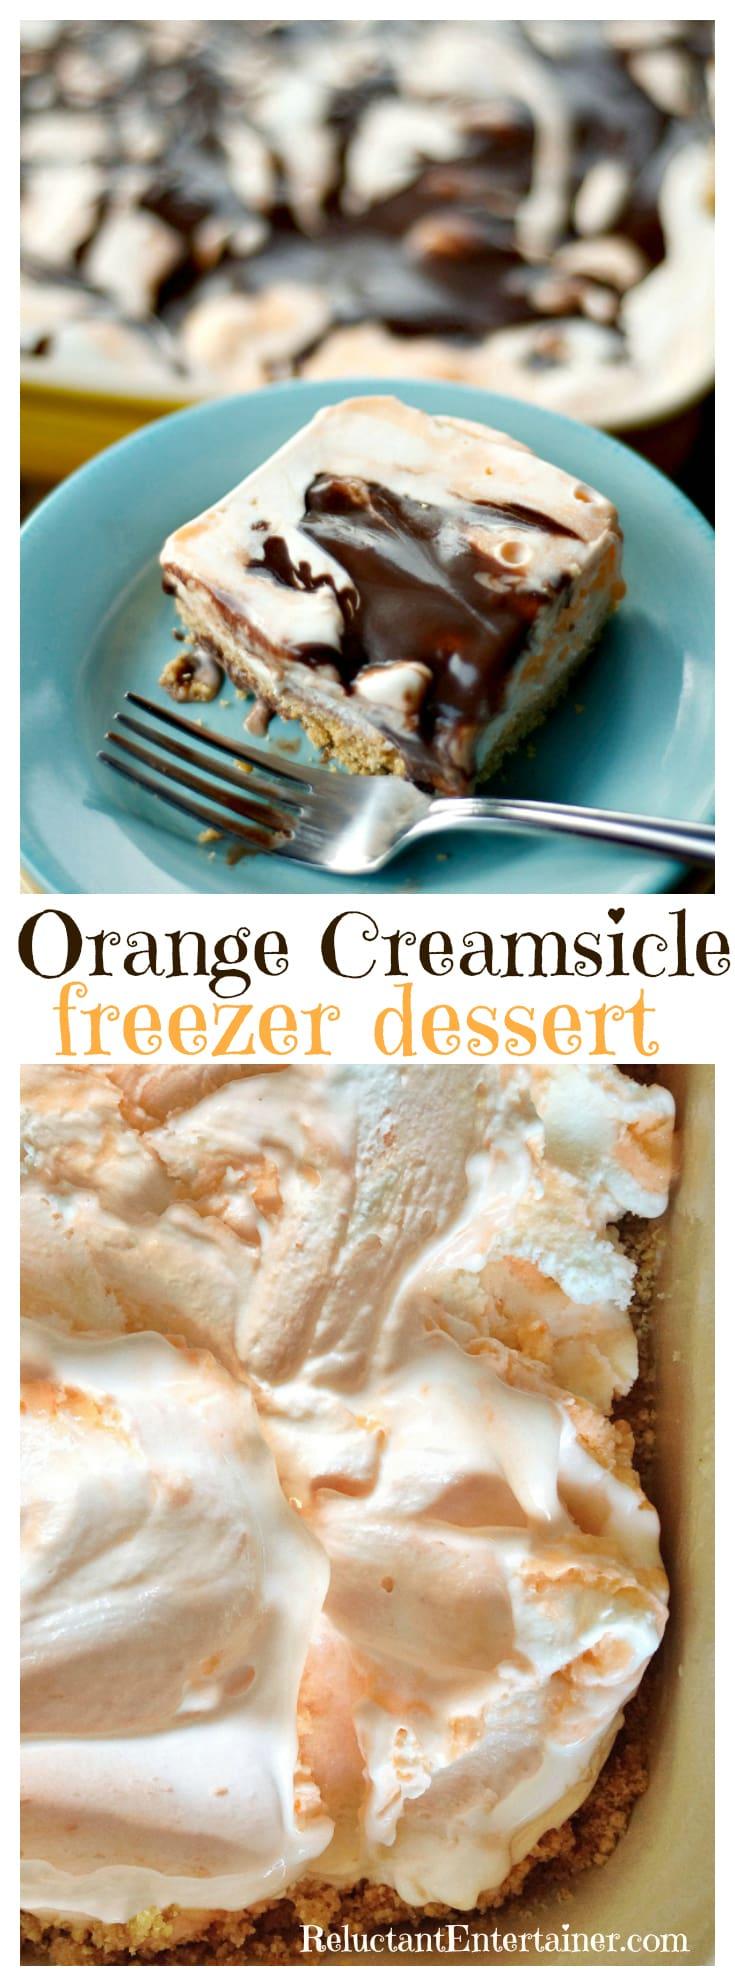 Orange Creamsicle Freezer Dessert Recipe